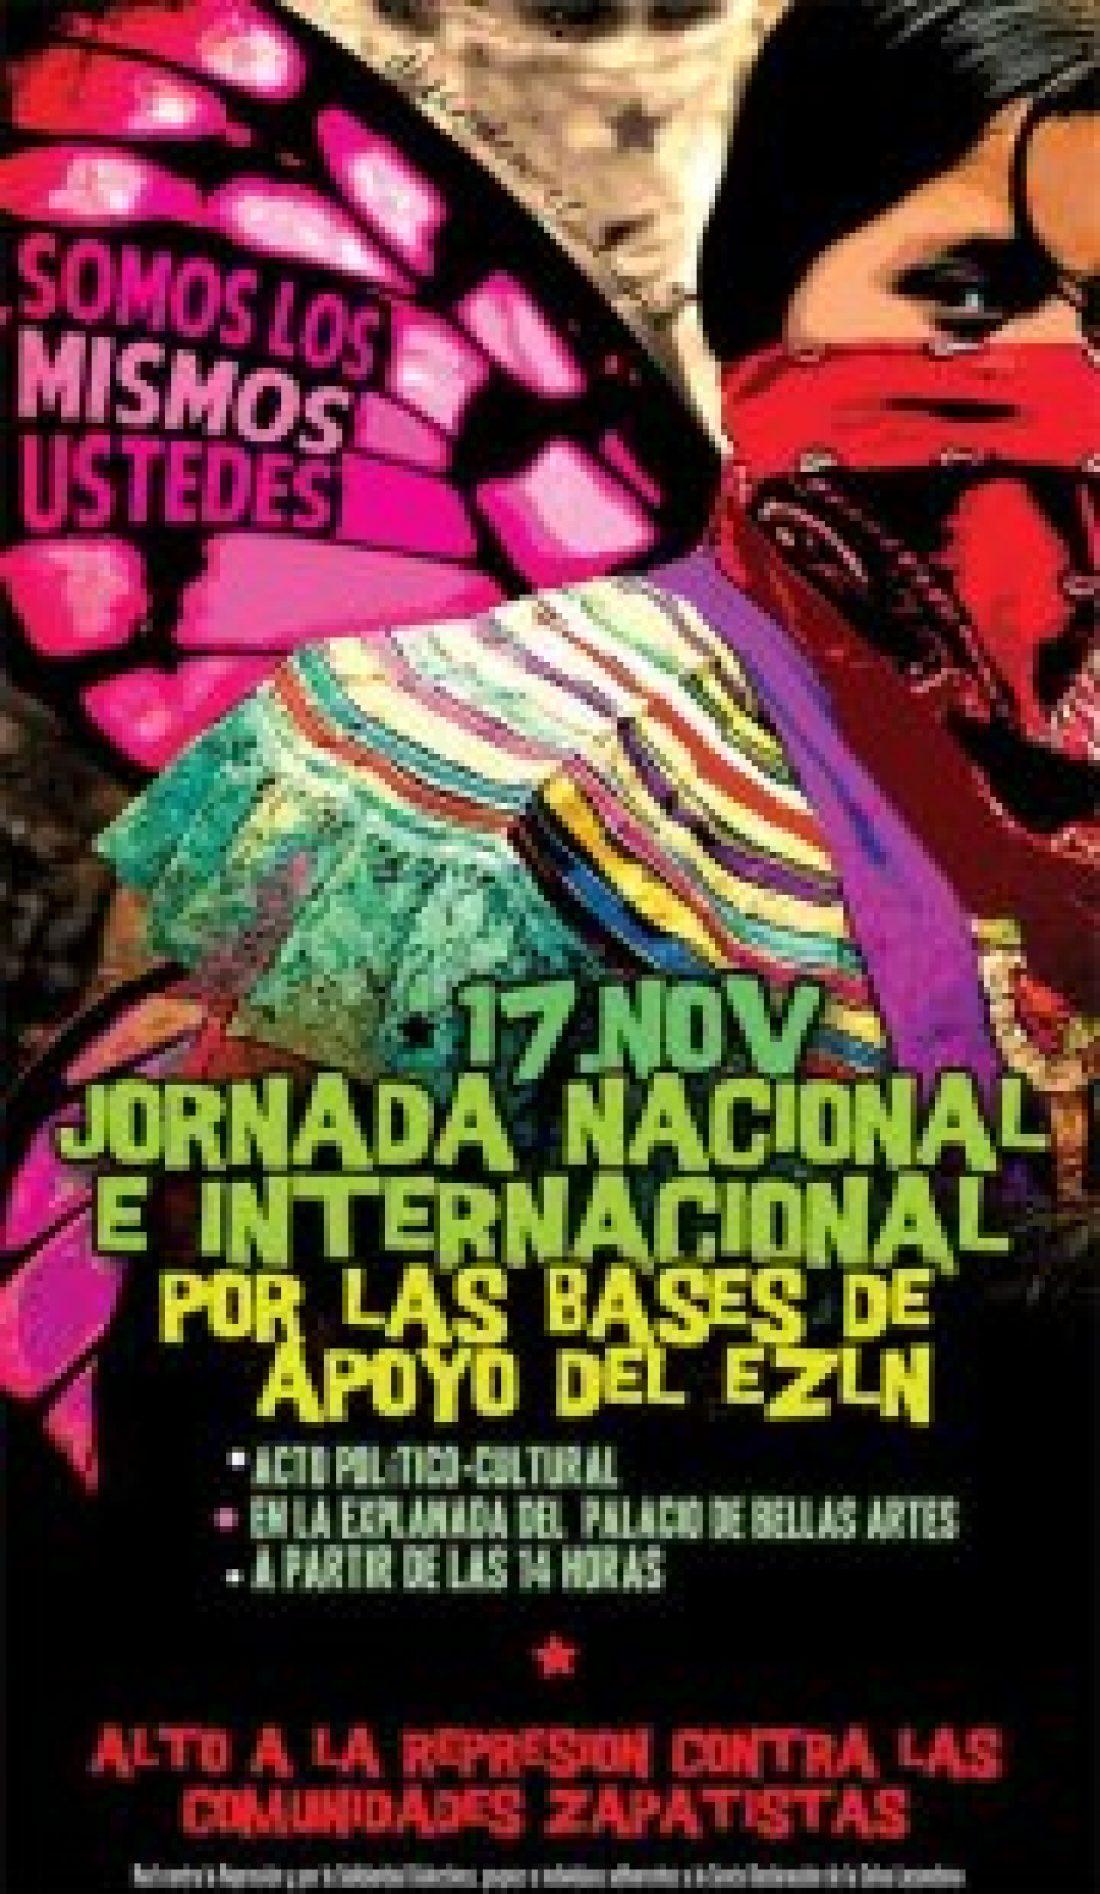 17-N: Jornada Nacional e Internacional sobre las Comunidades Zapatistas